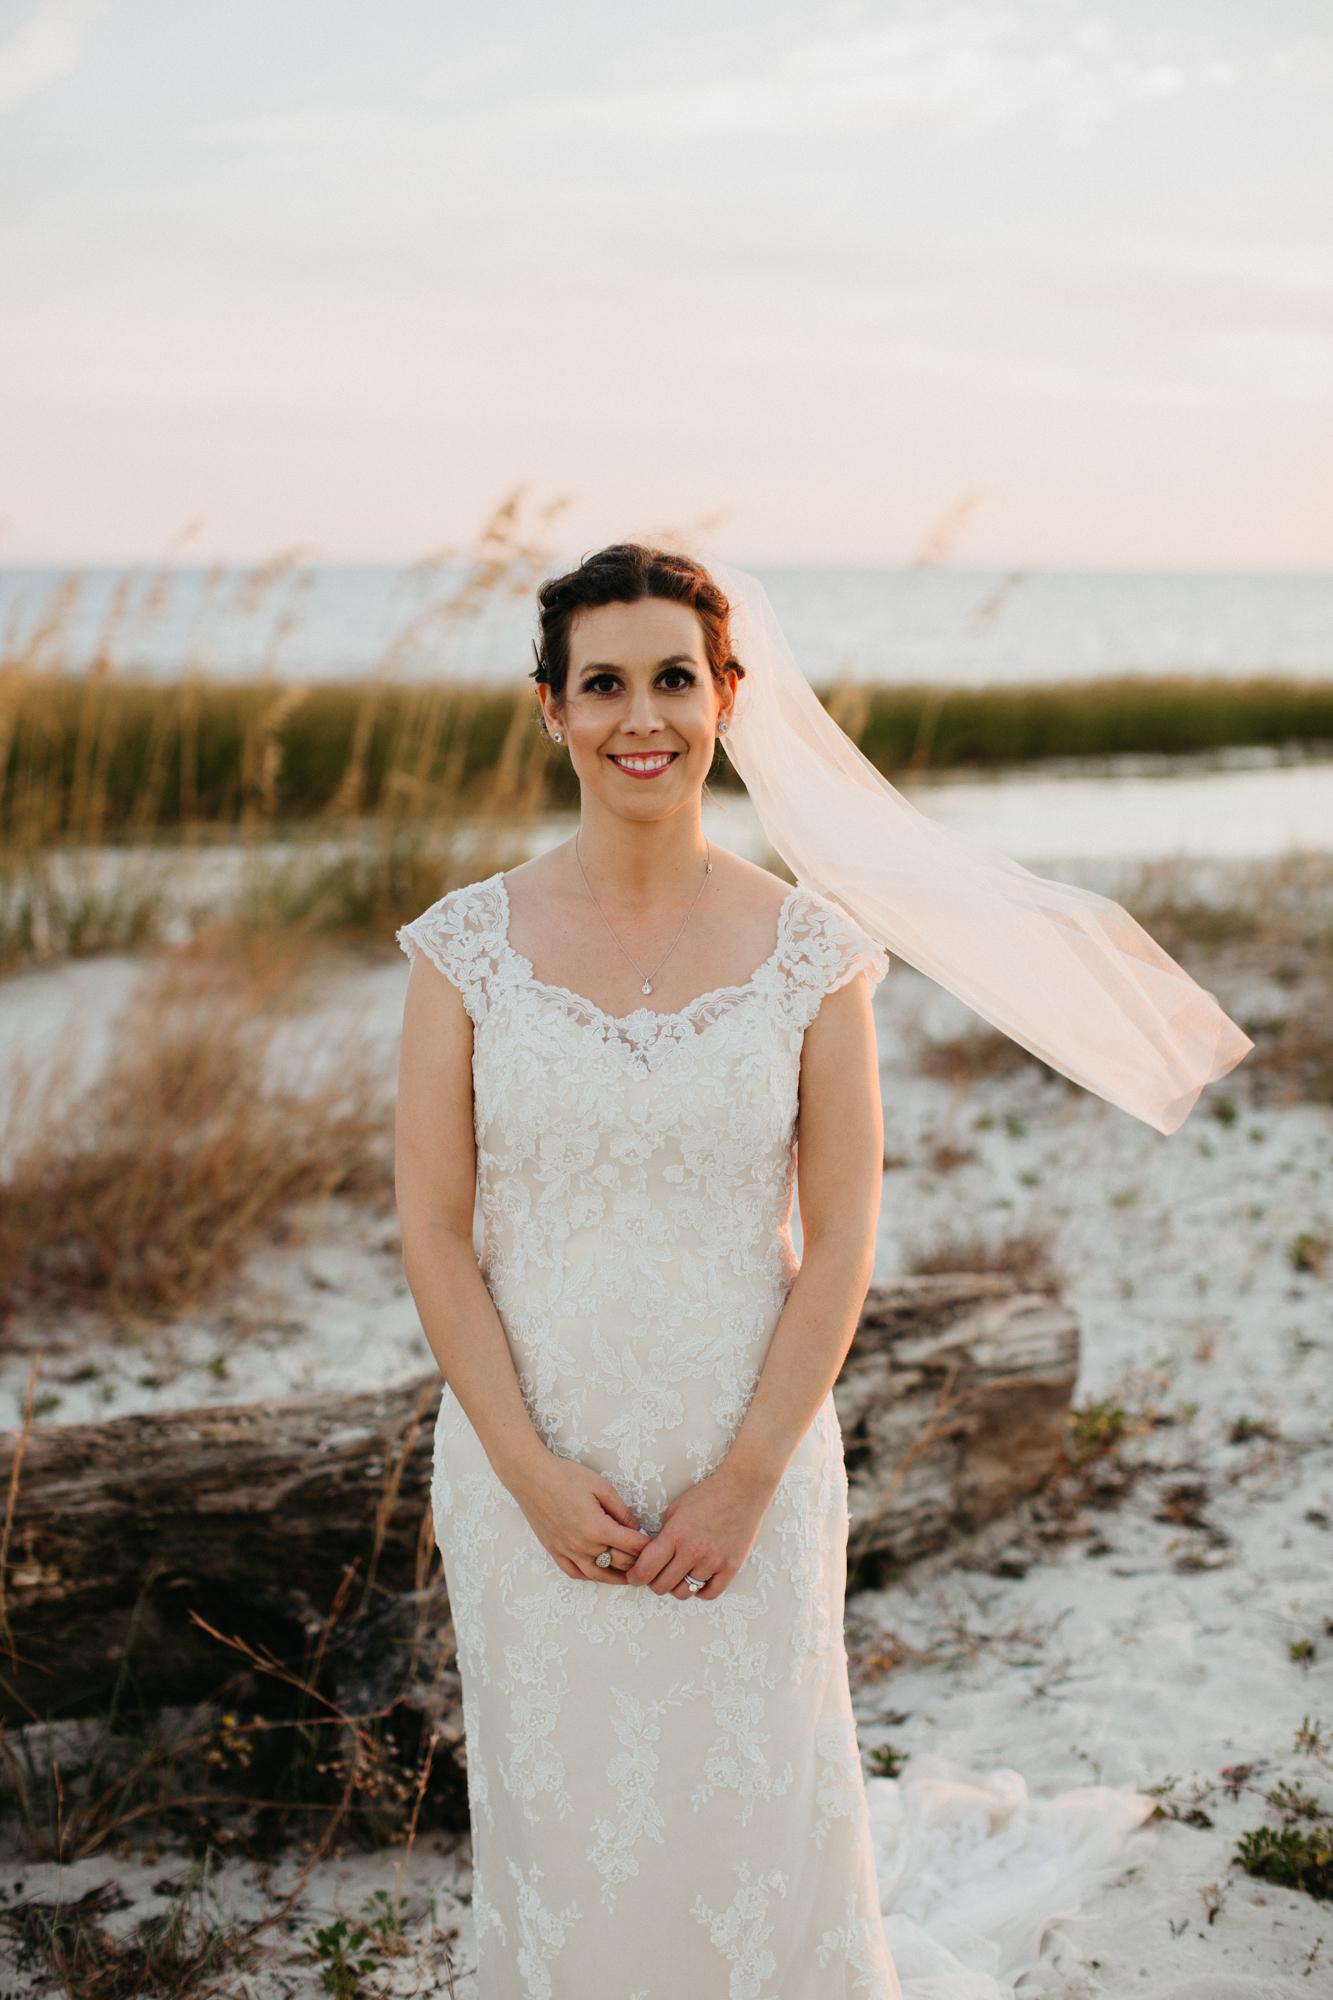 Biloxi Beach wedding